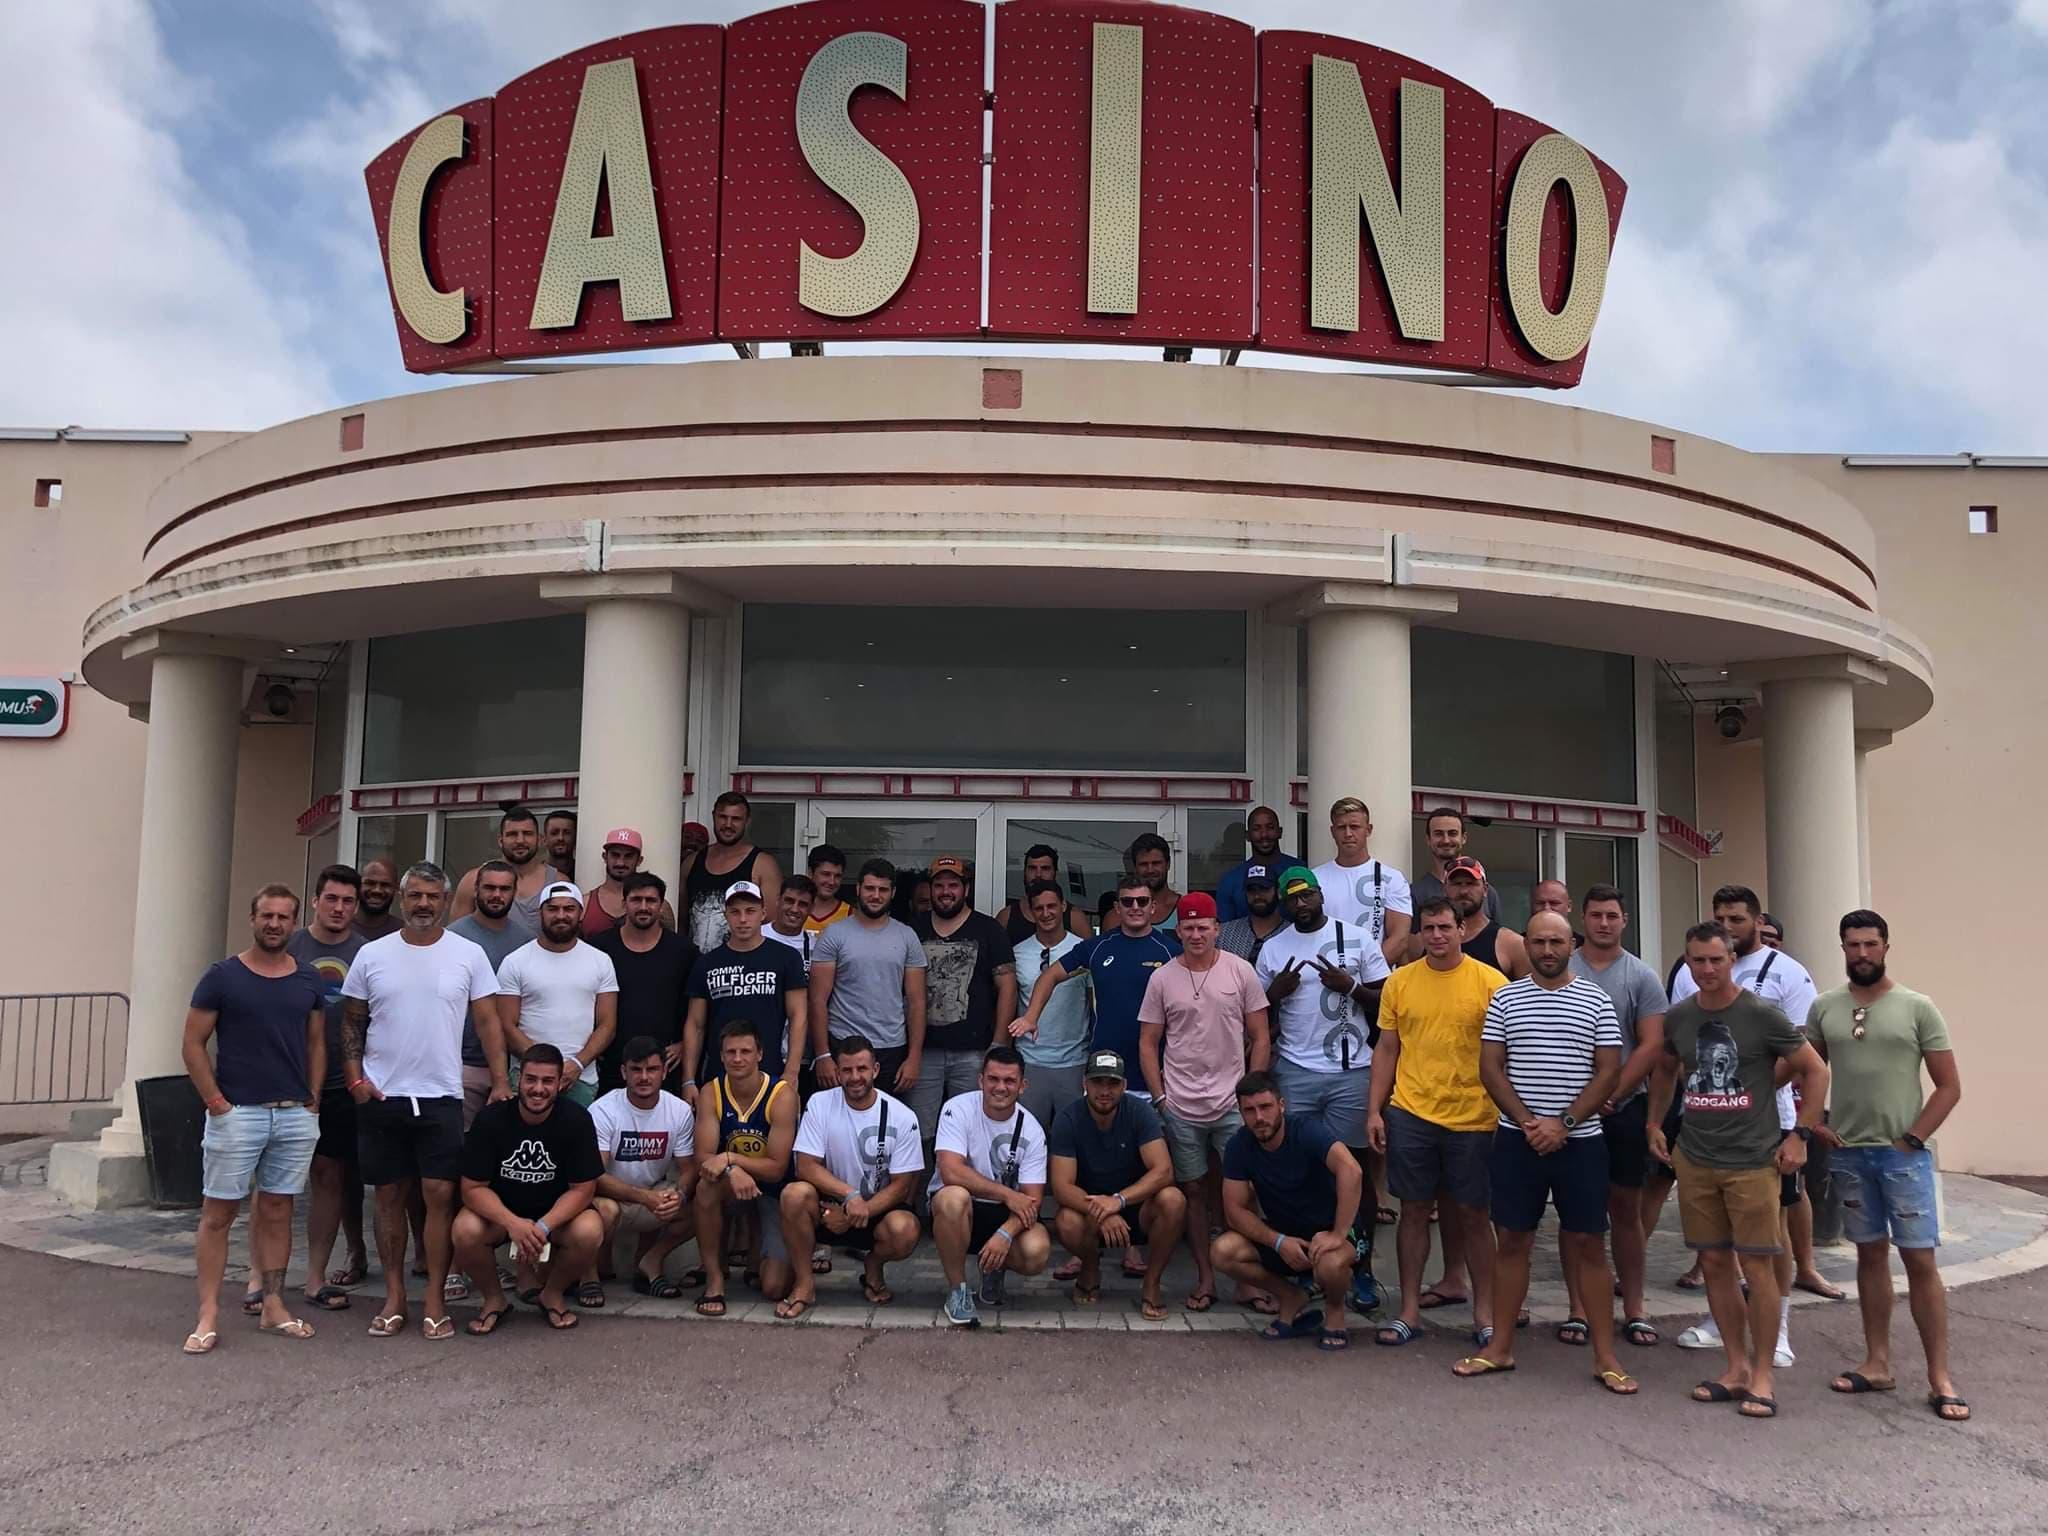 Casino Gruissan